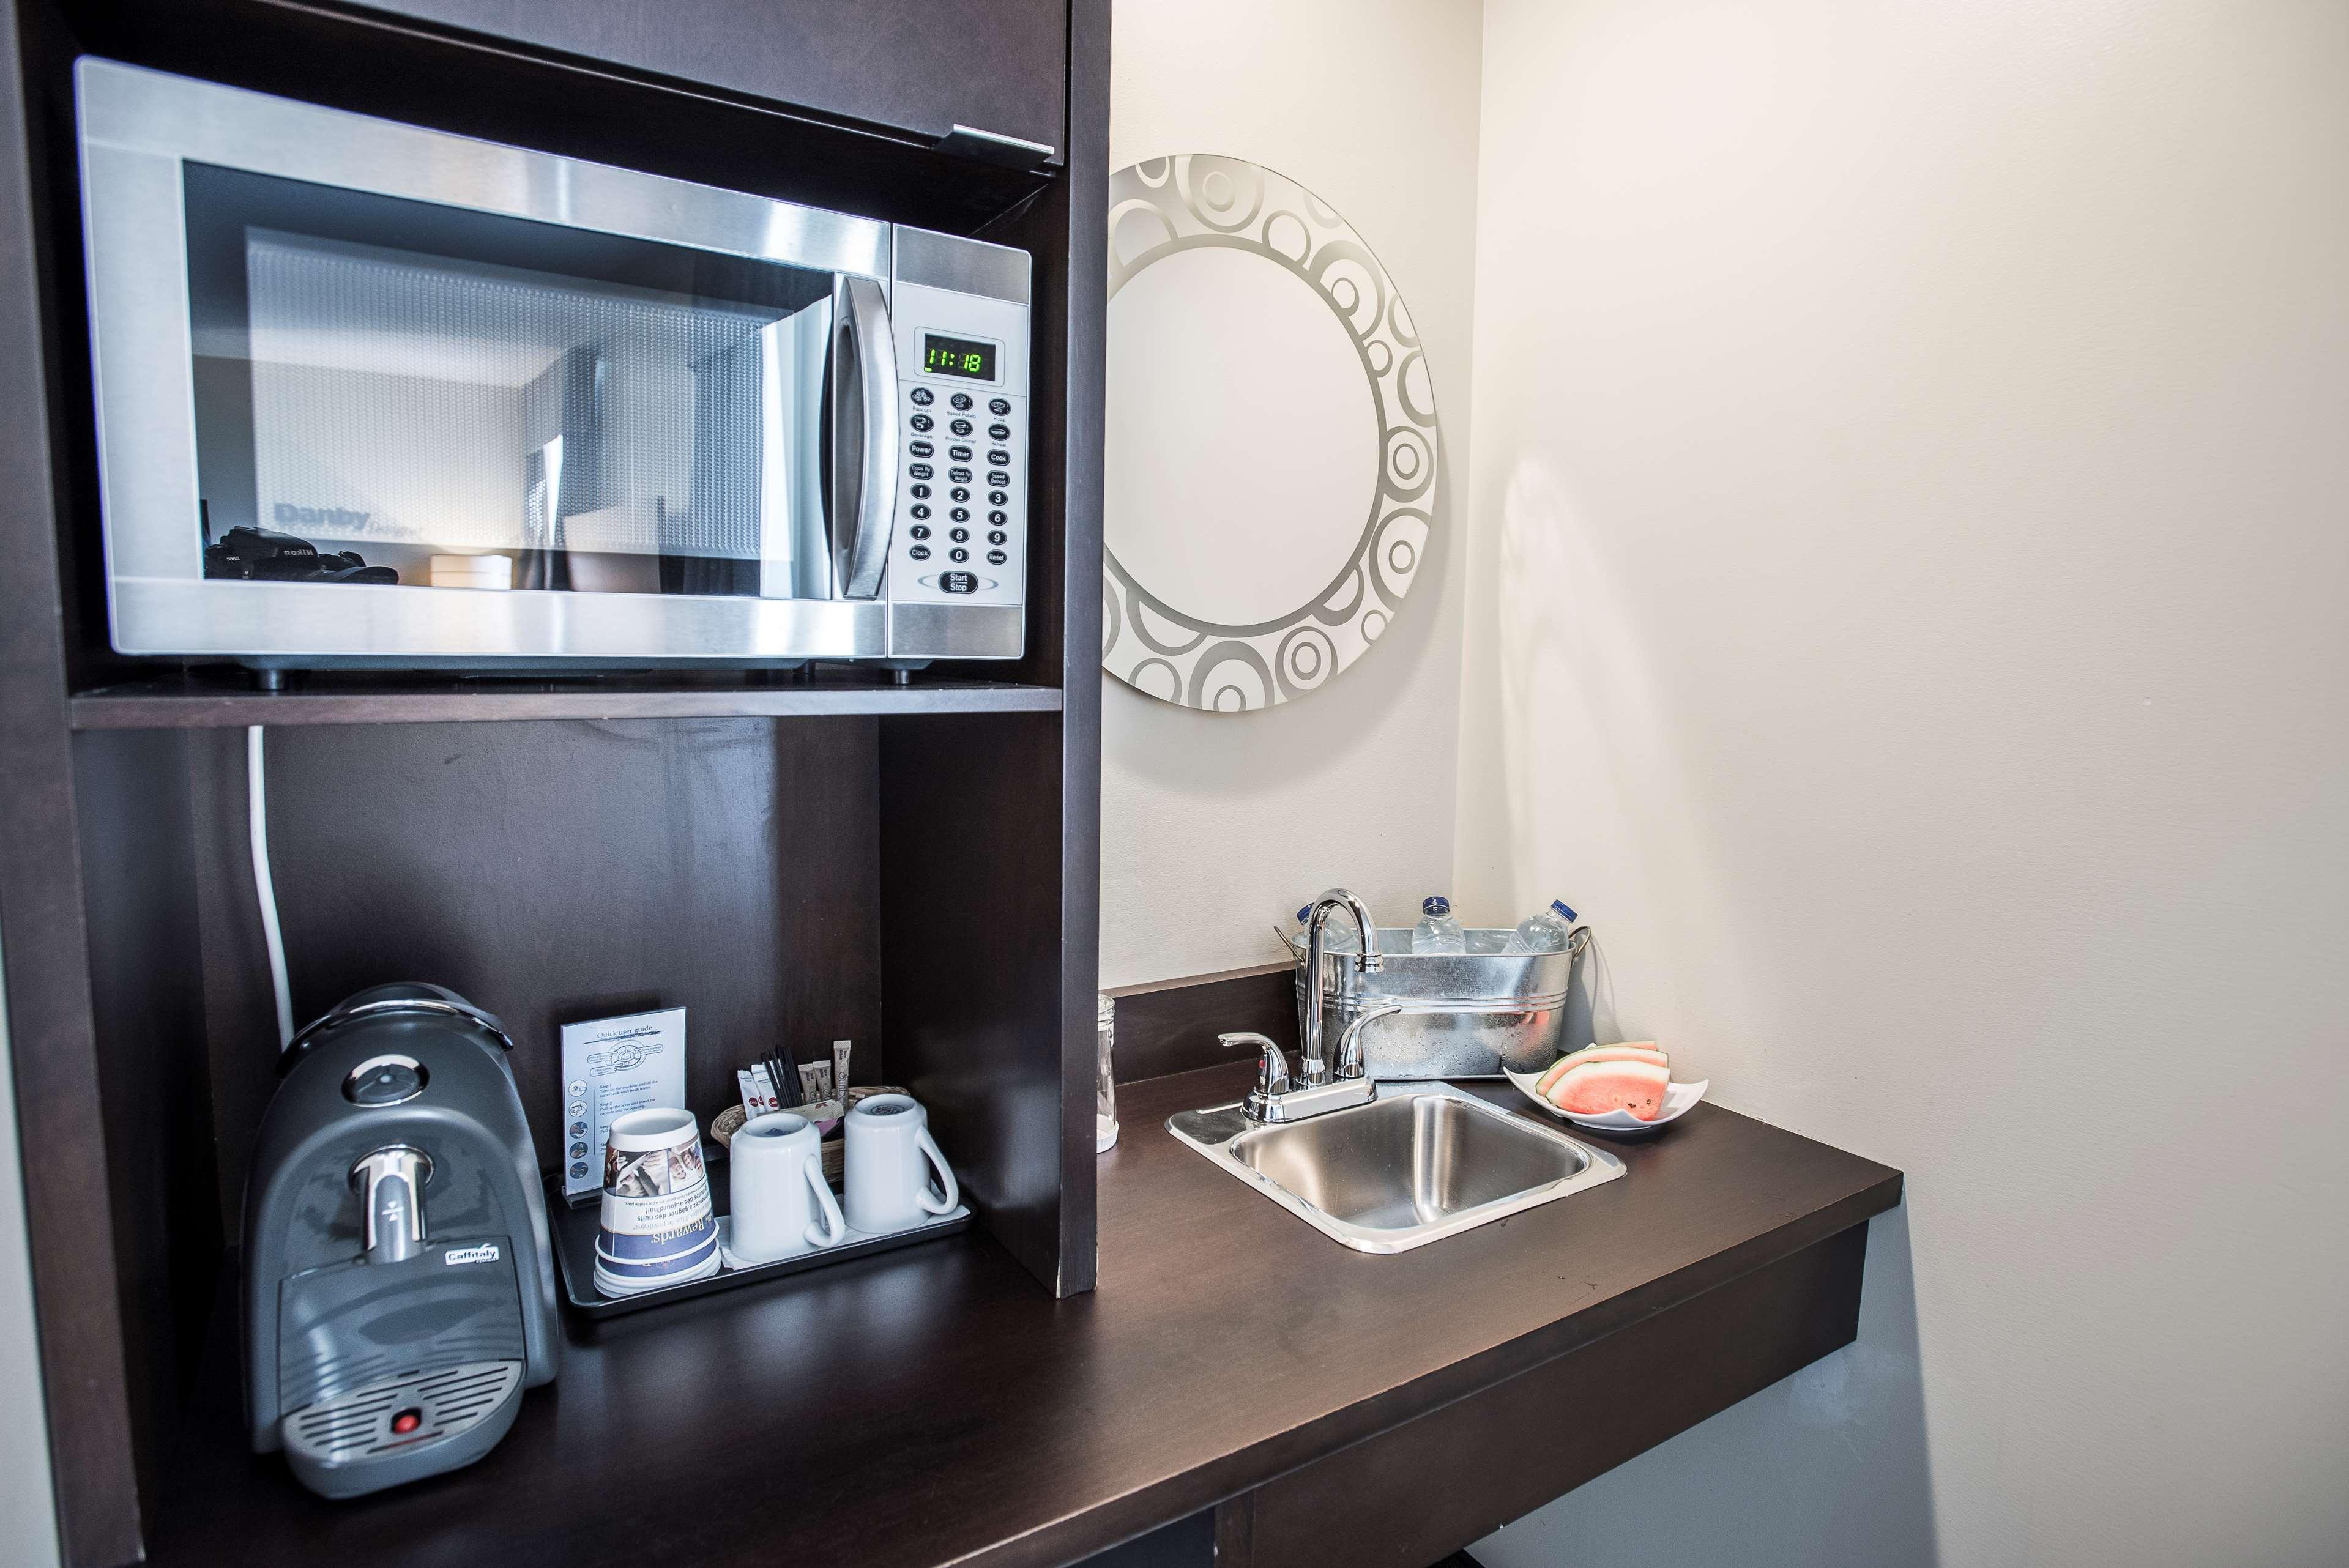 Best Western Plus Hotel Albert Rouyn-Noranda à Rouyn-Noranda: King Suite